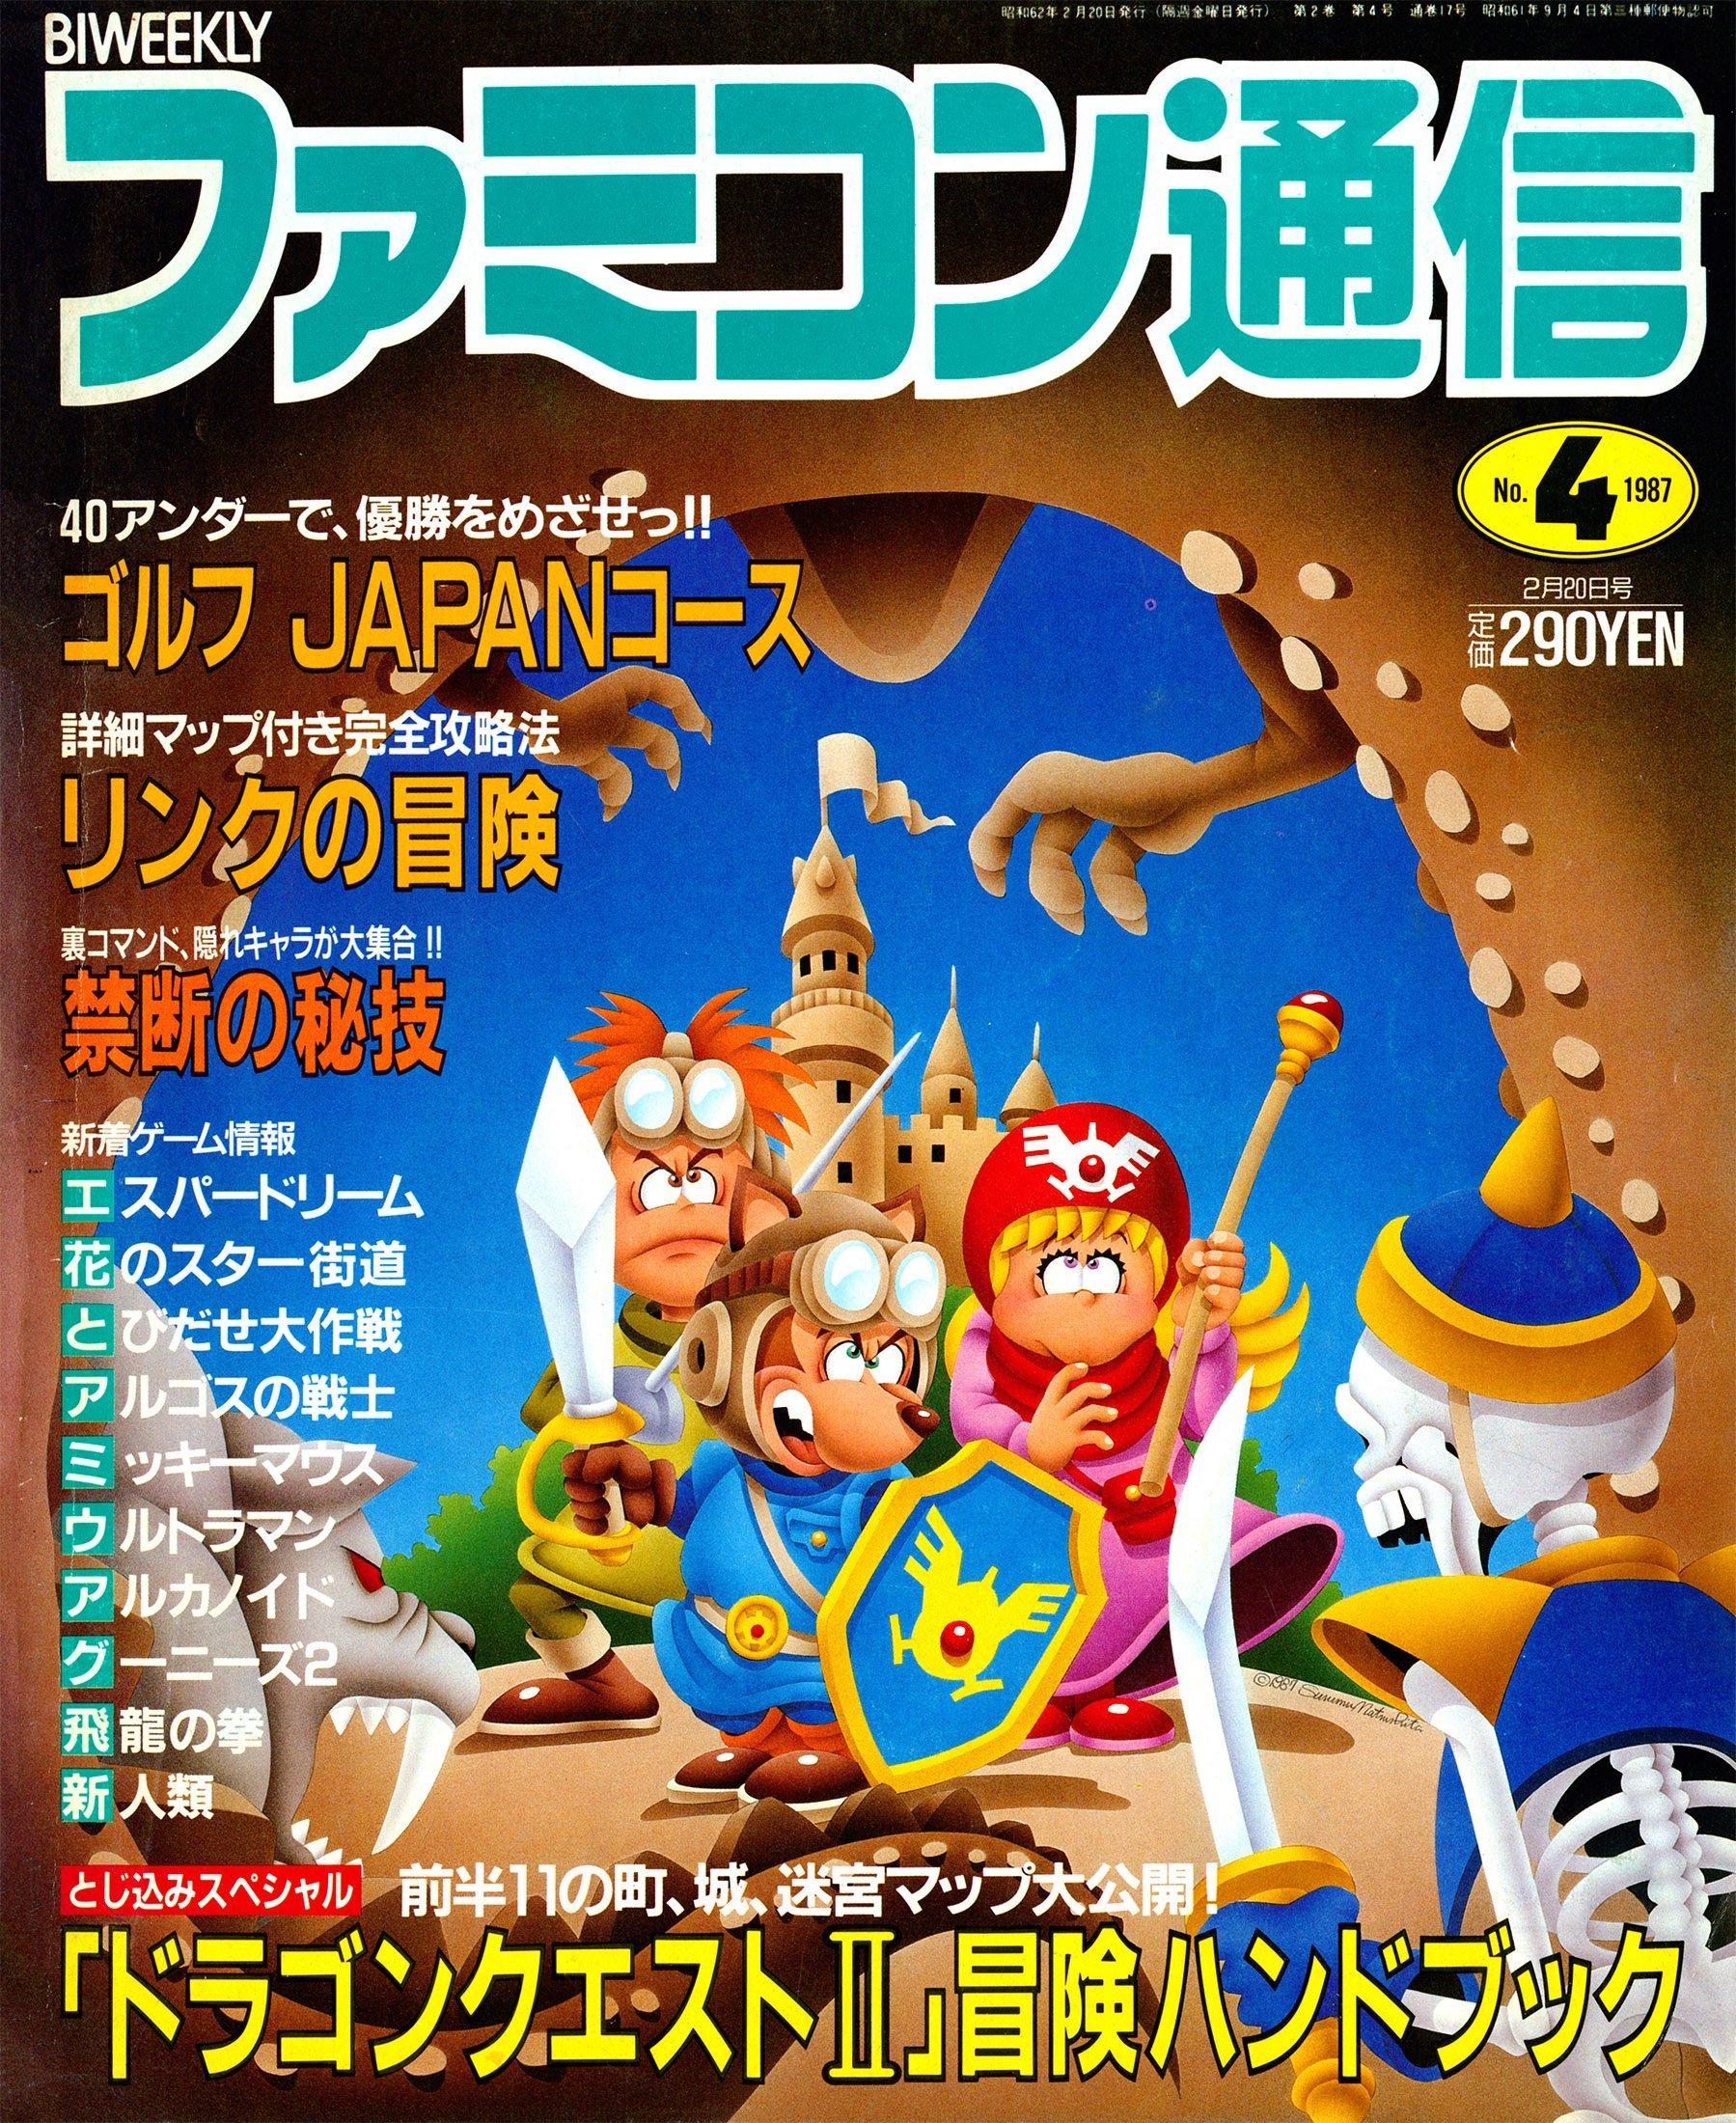 Famitsu 0017 (February 20, 1987)